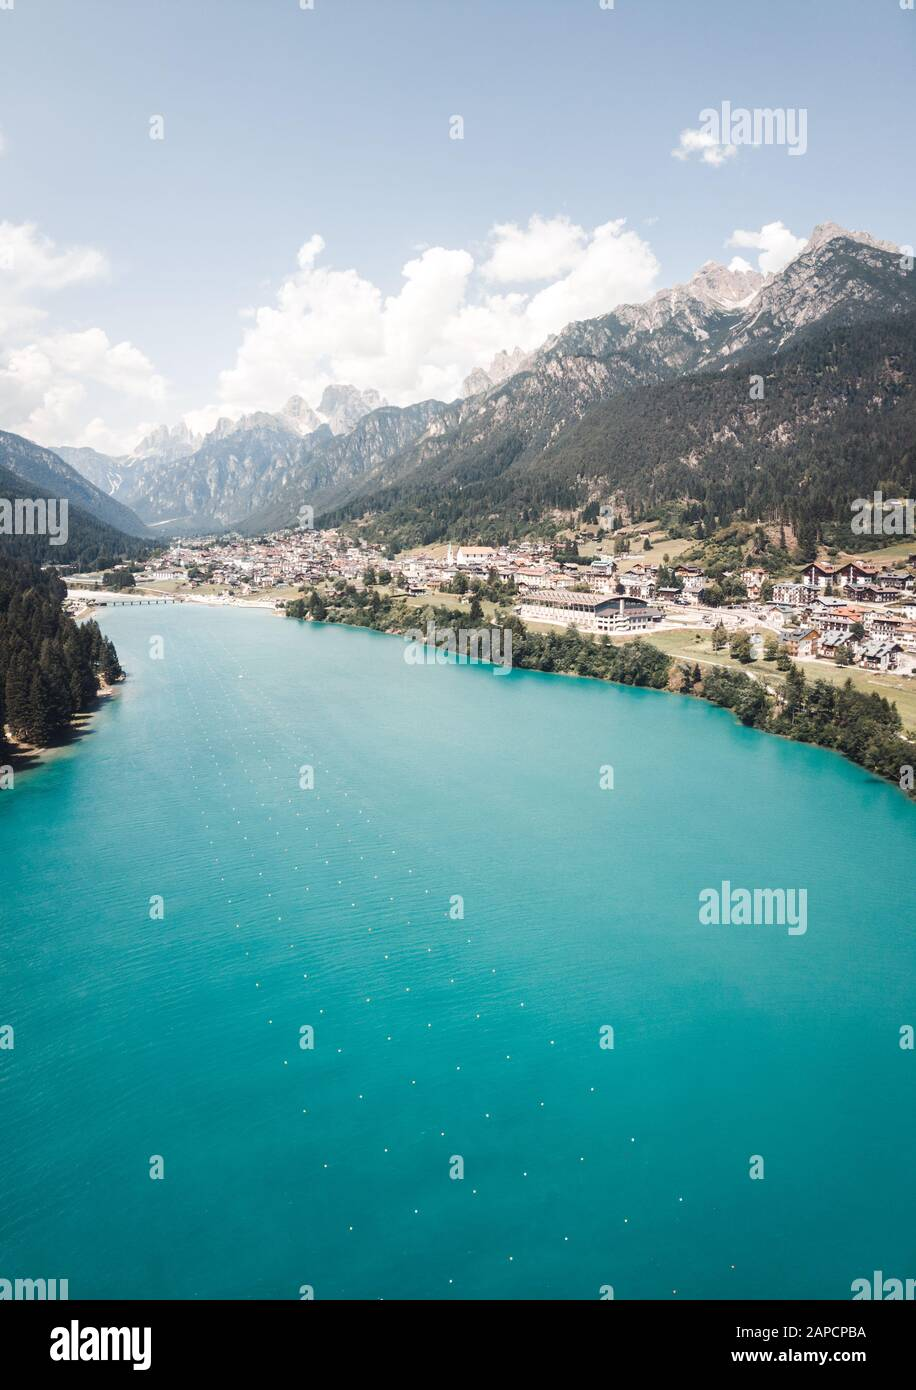 Horizontal panorama of lago di santa caterina (Auronzosee) in Auronzo di Cadore Provinz Stock Photo